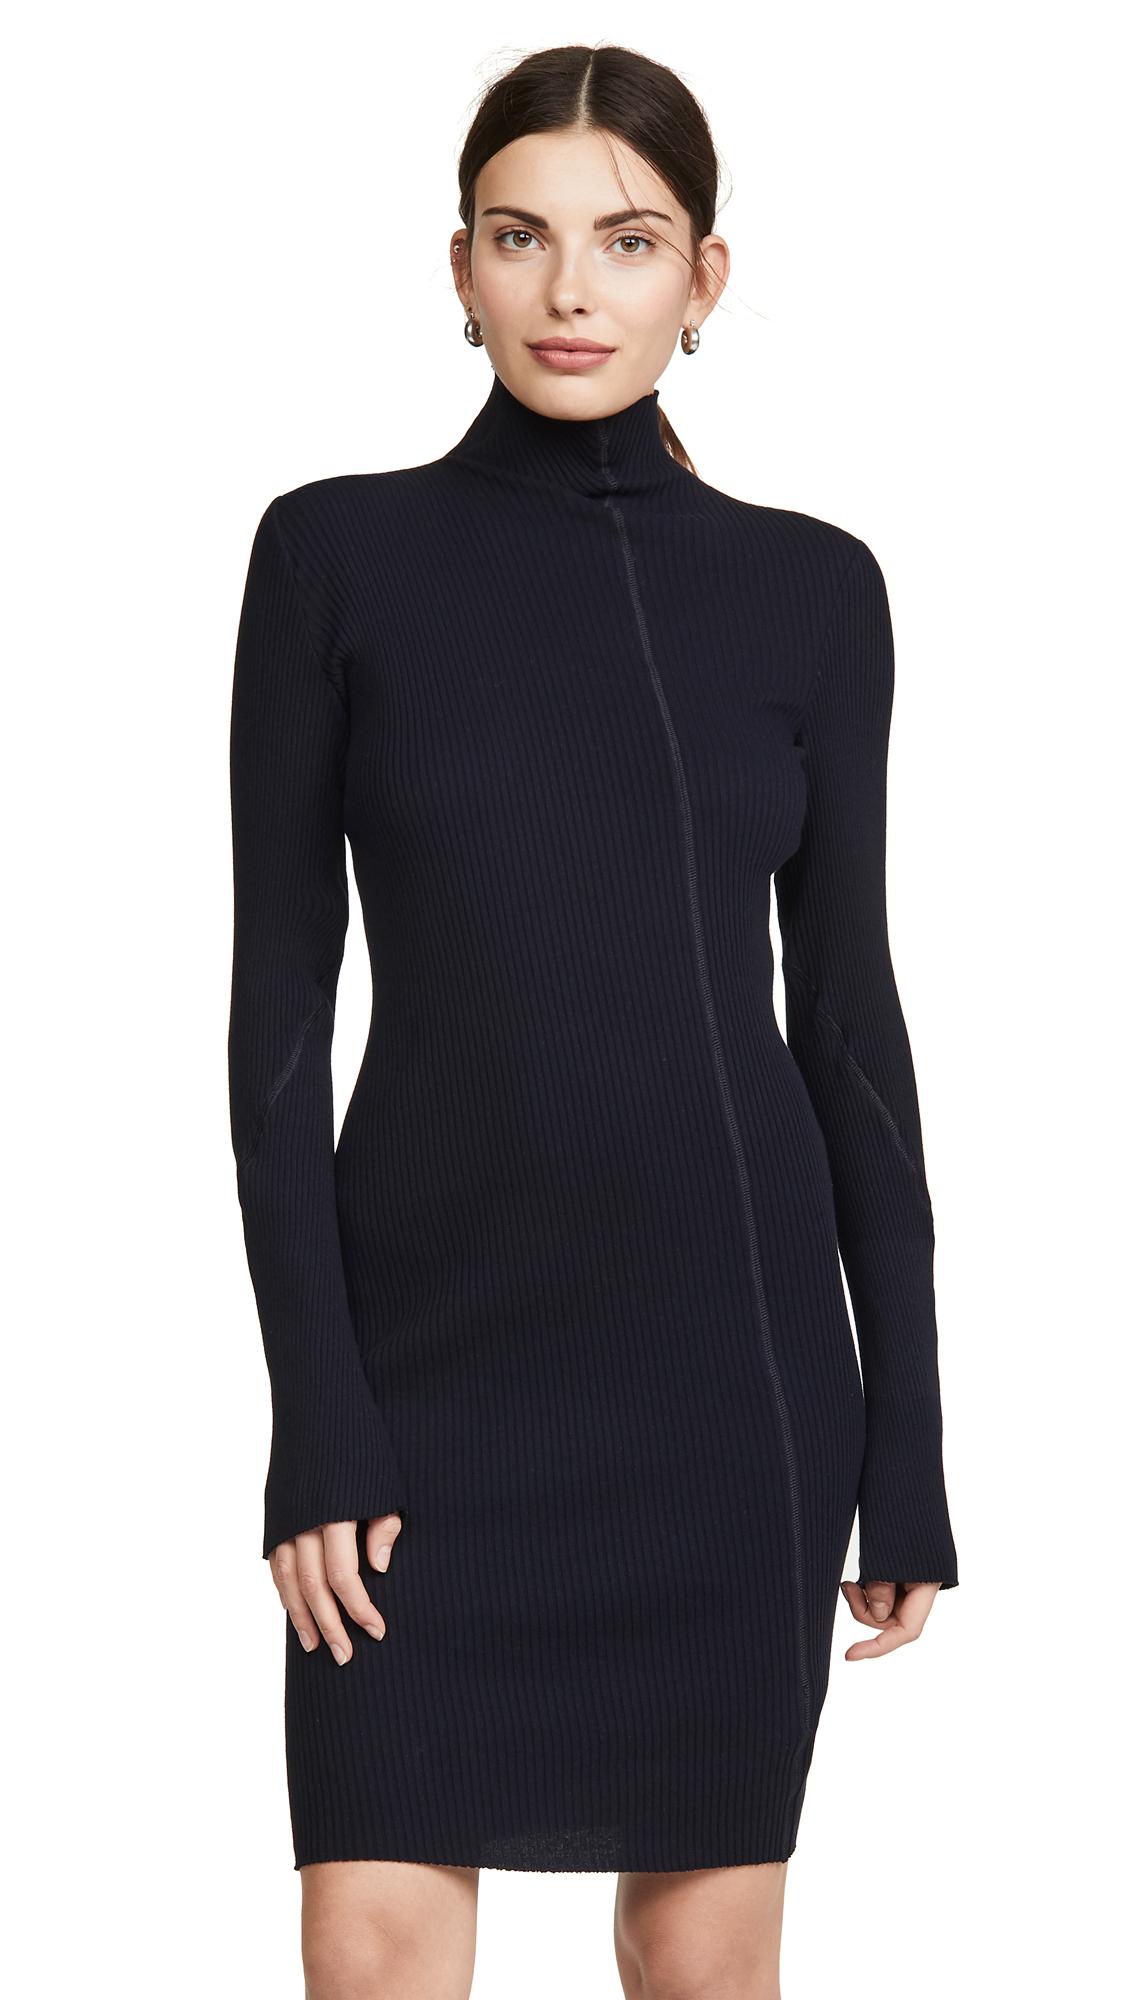 Helmut Lang Cotton Rib High Neck Dress - Ink